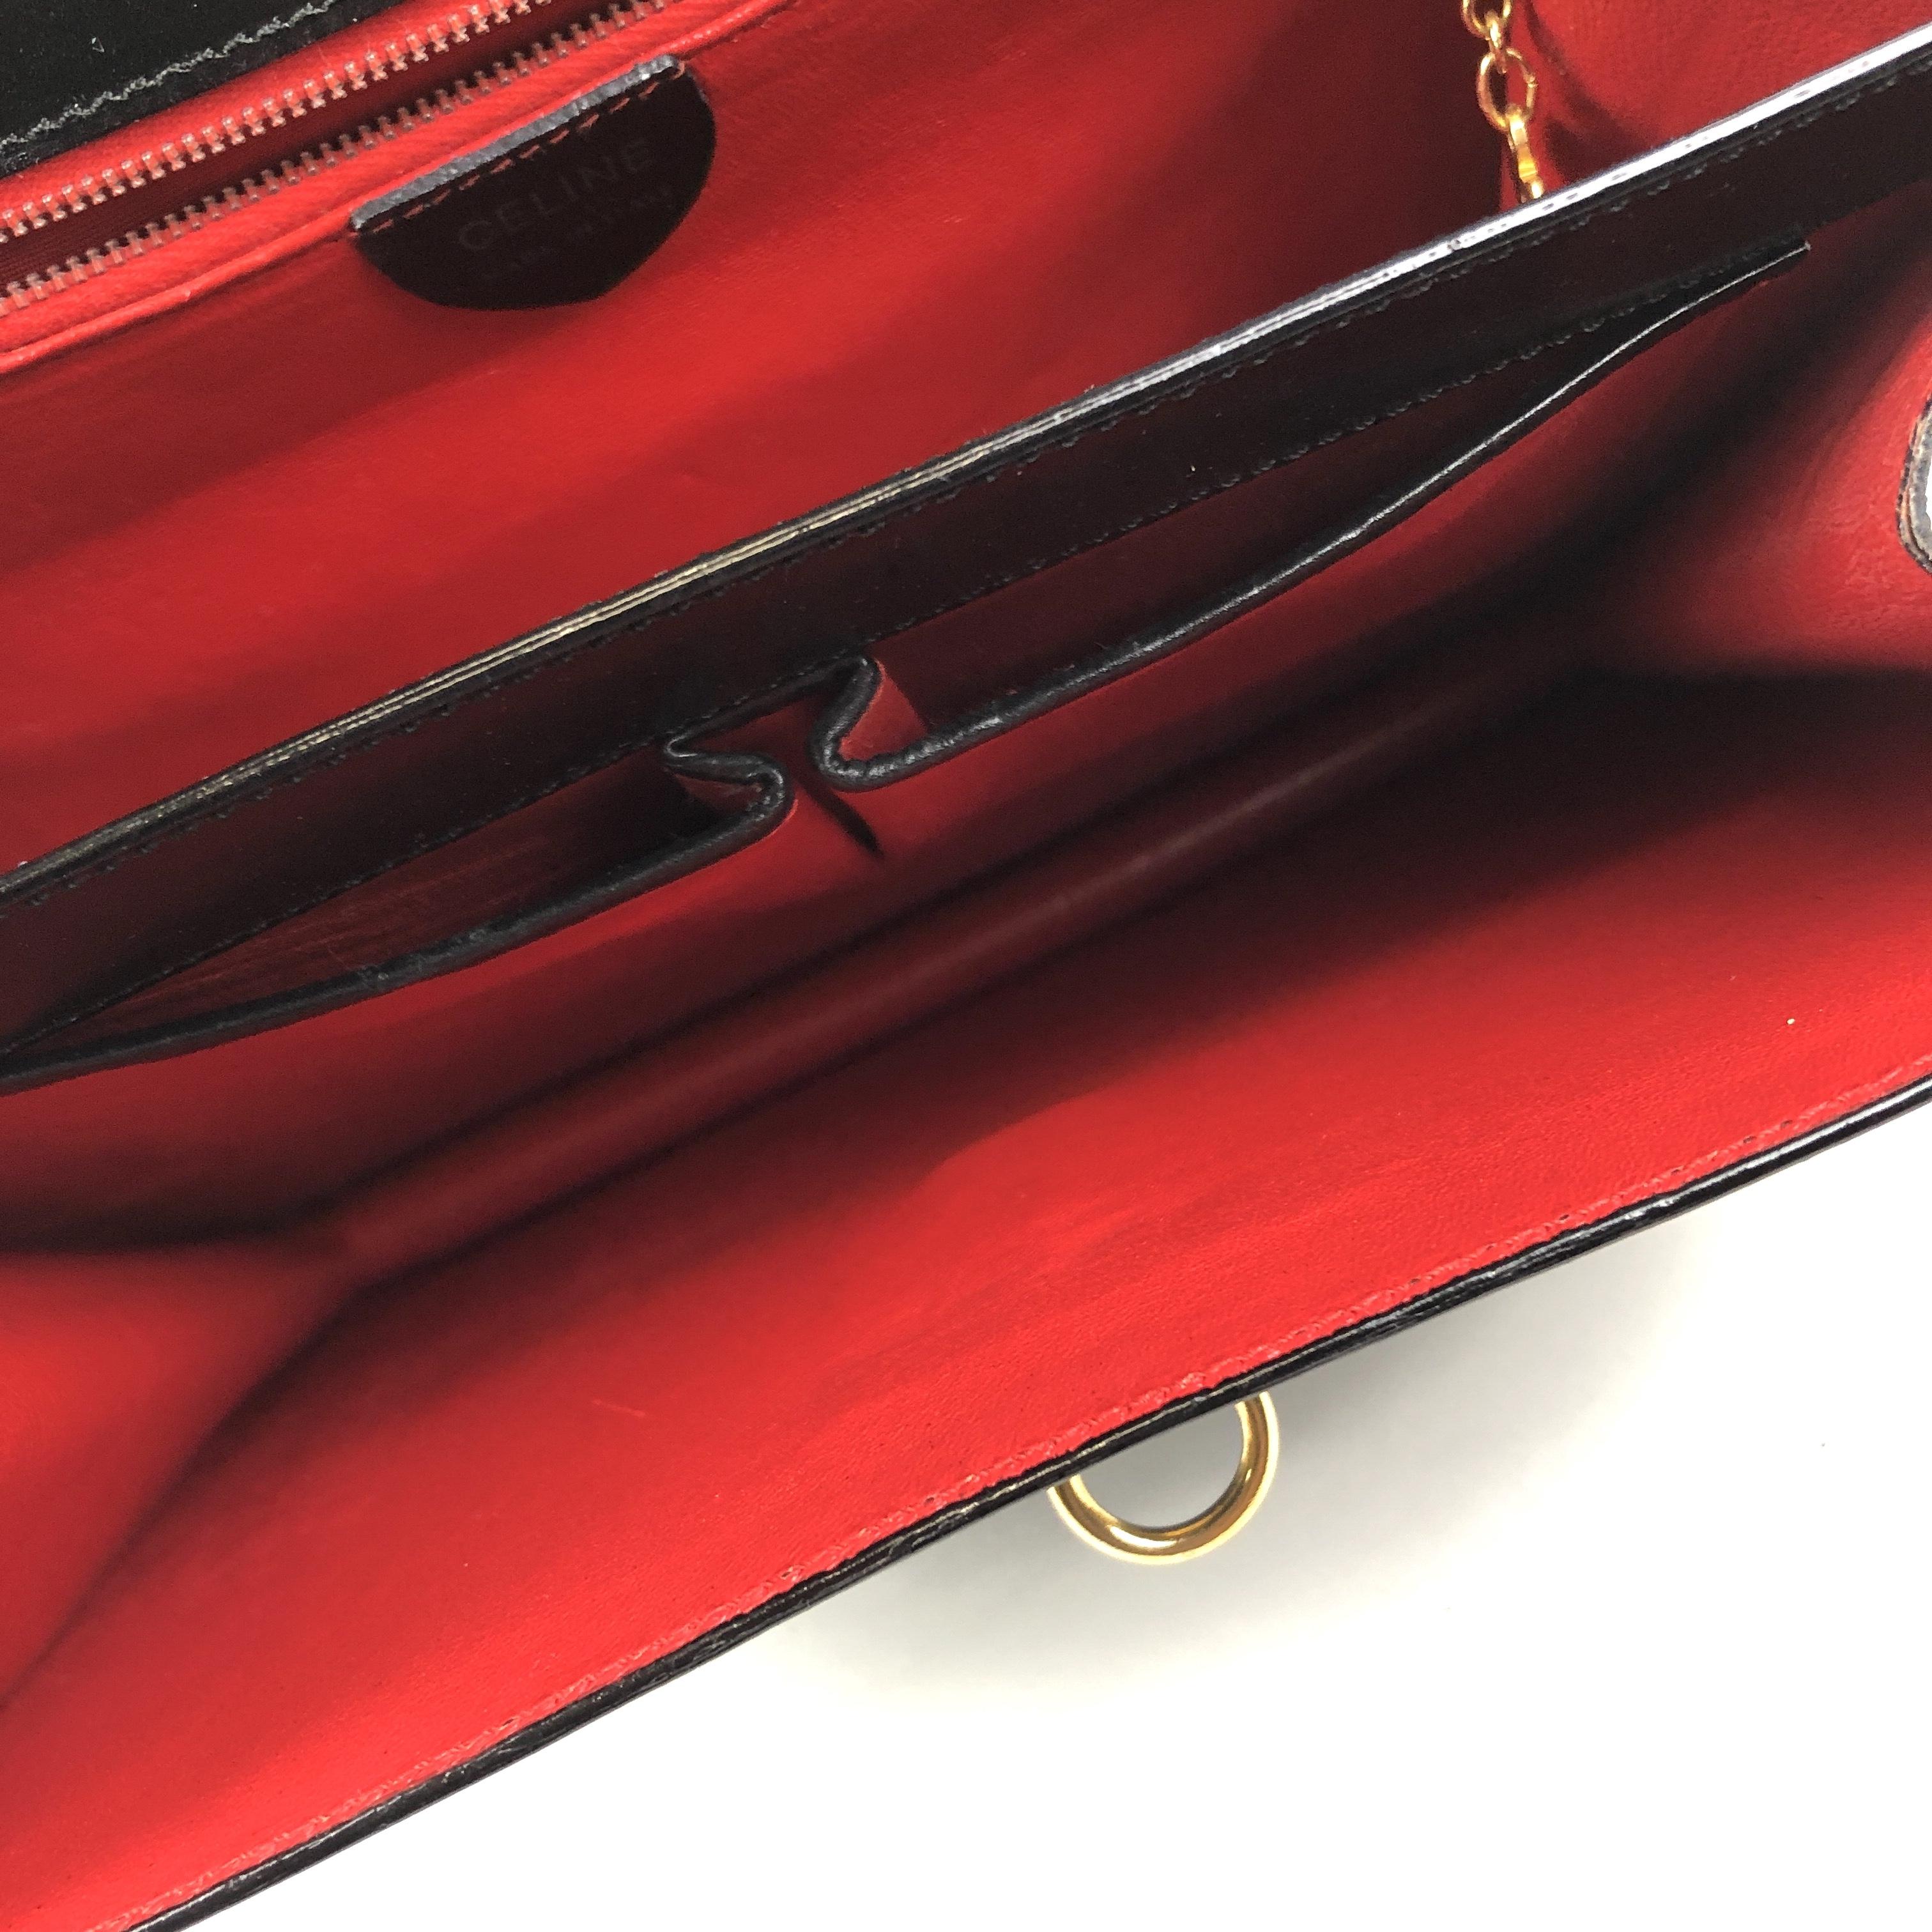 f5316ff48adc CELINE セリーヌ 3連チェーン ガンチーニ レザー ハンドバッグ ブラック vintage ヴィンテージ オールドセリーヌ マンテル